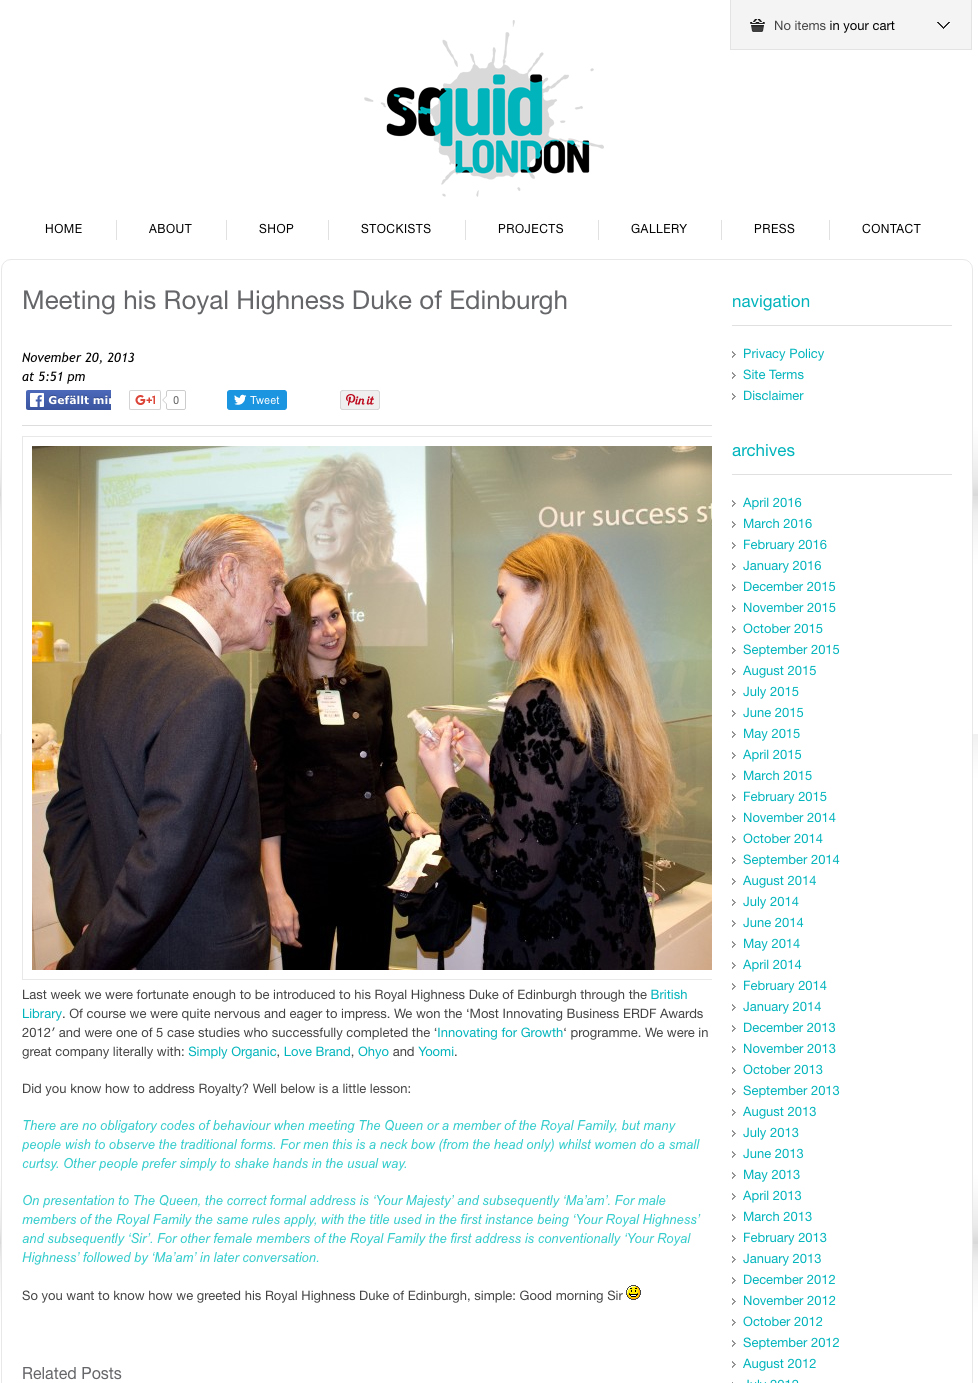 November 2013 Meeting his Royal Highness Duke of Edinburgh